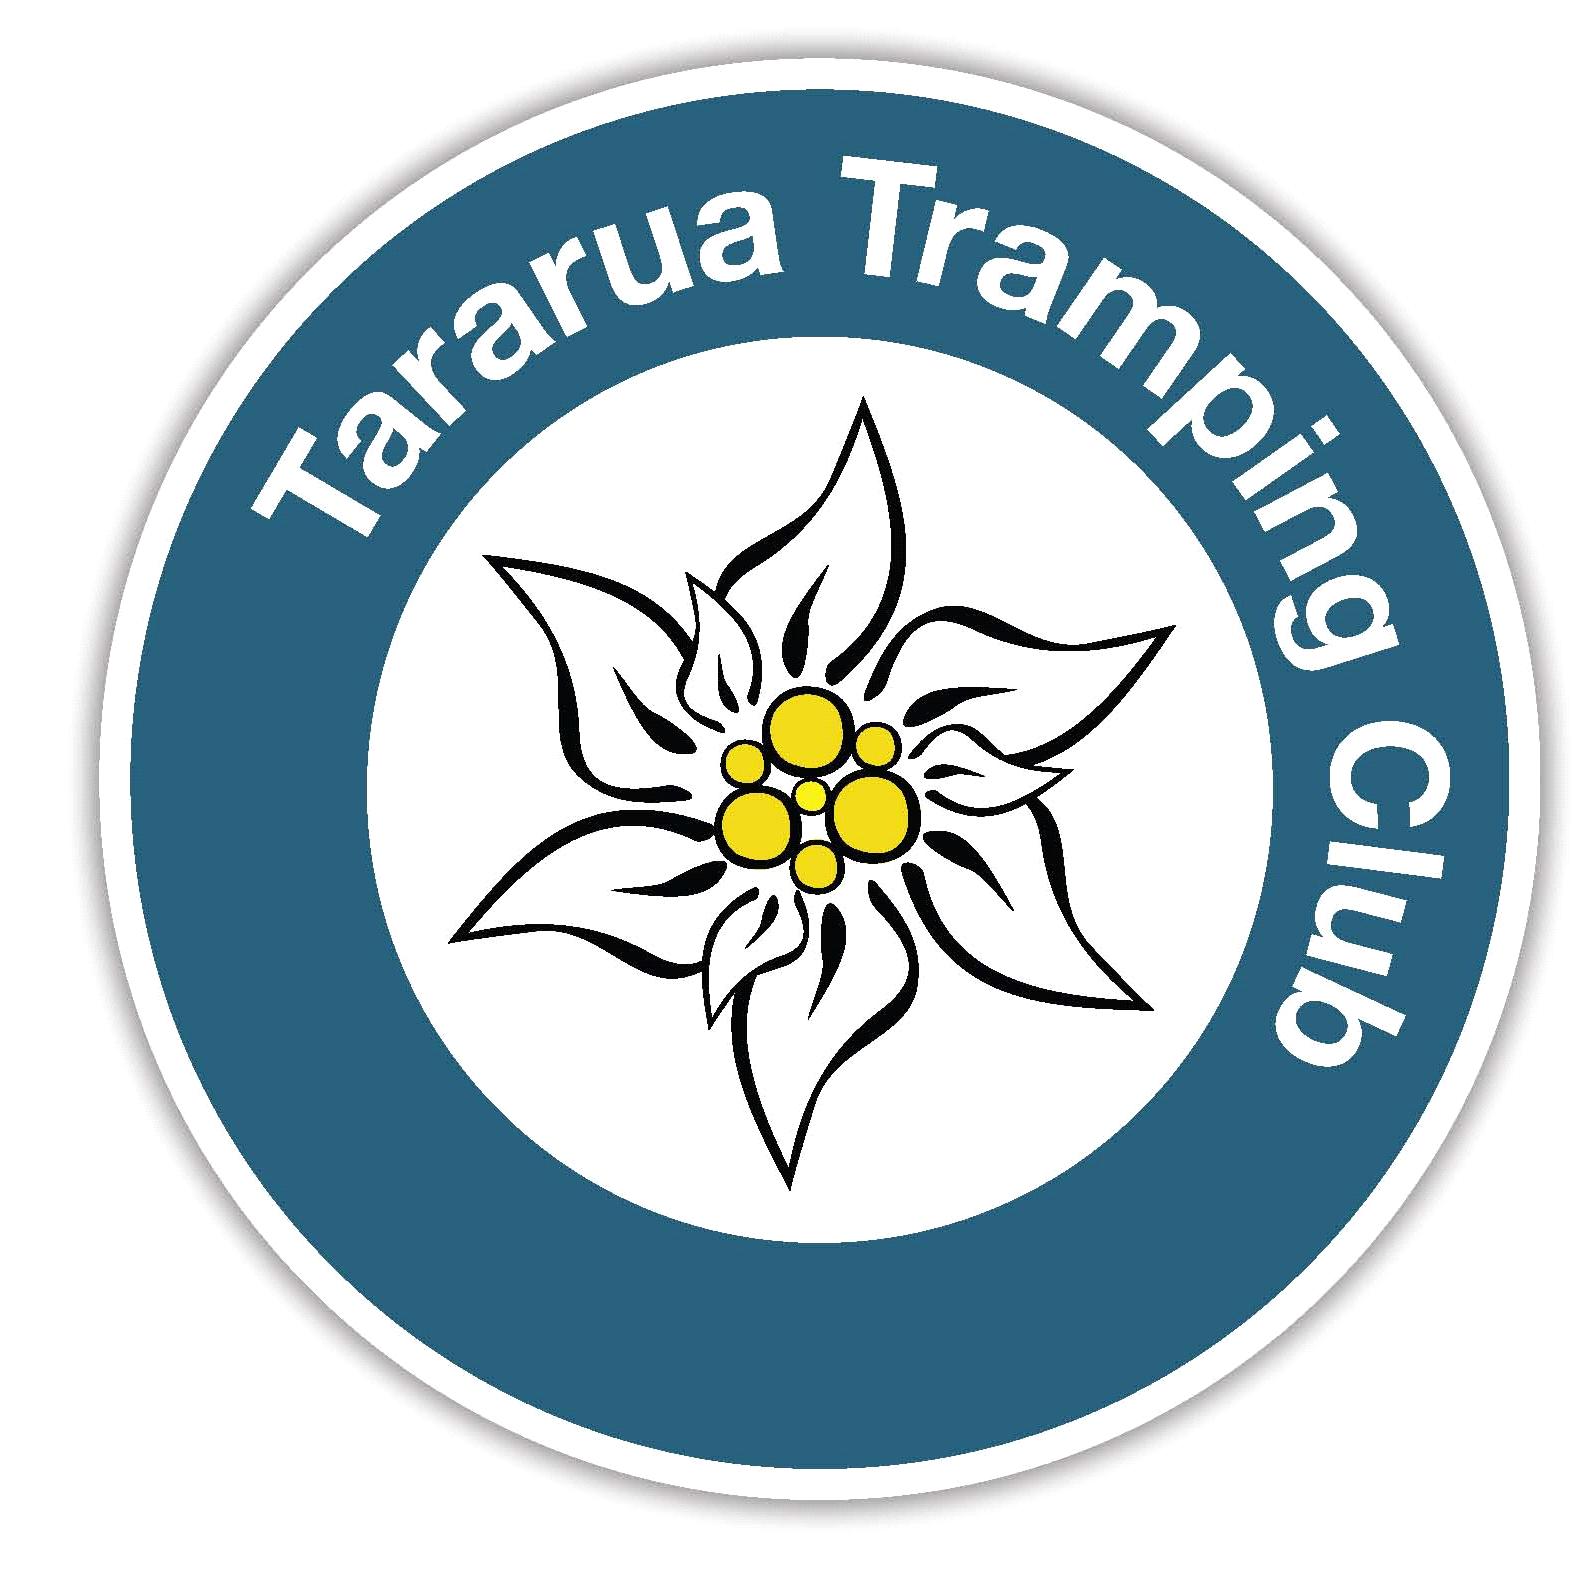 Option 2b Stylised Edelweiss flower stamp logo